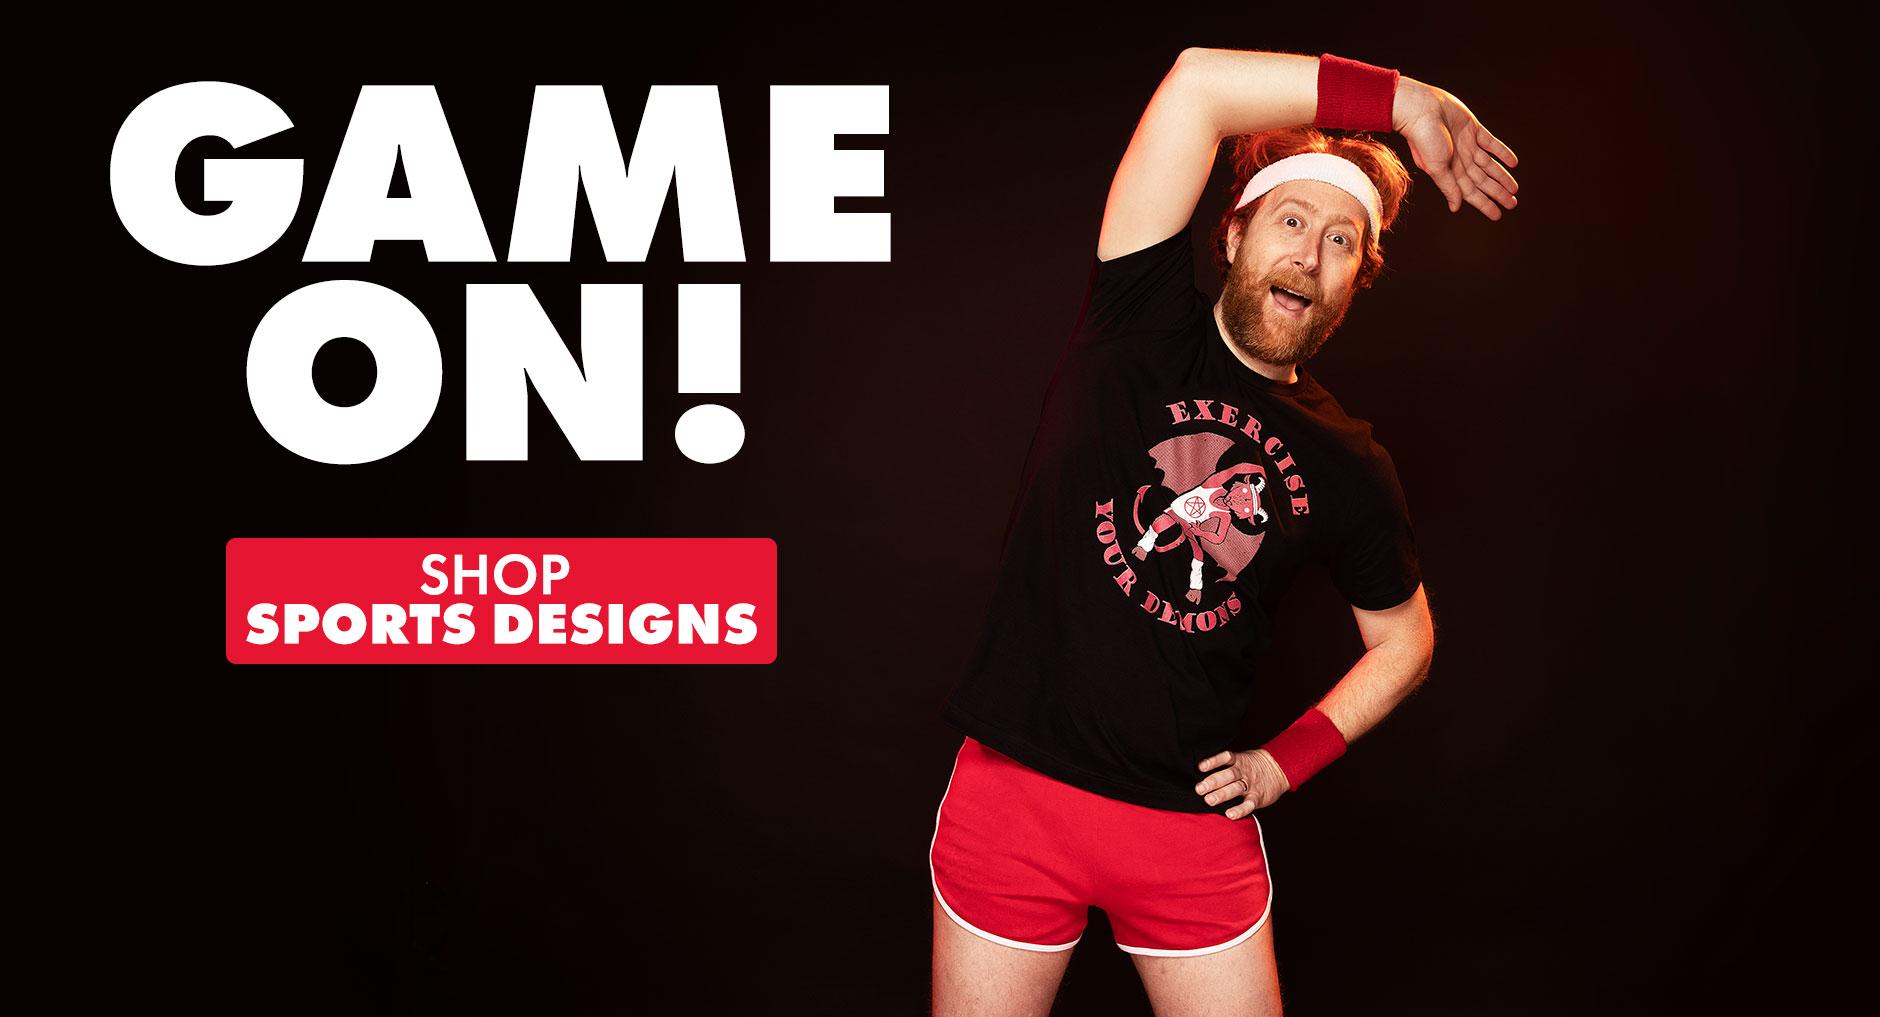 Shop Sports designs on Threadless